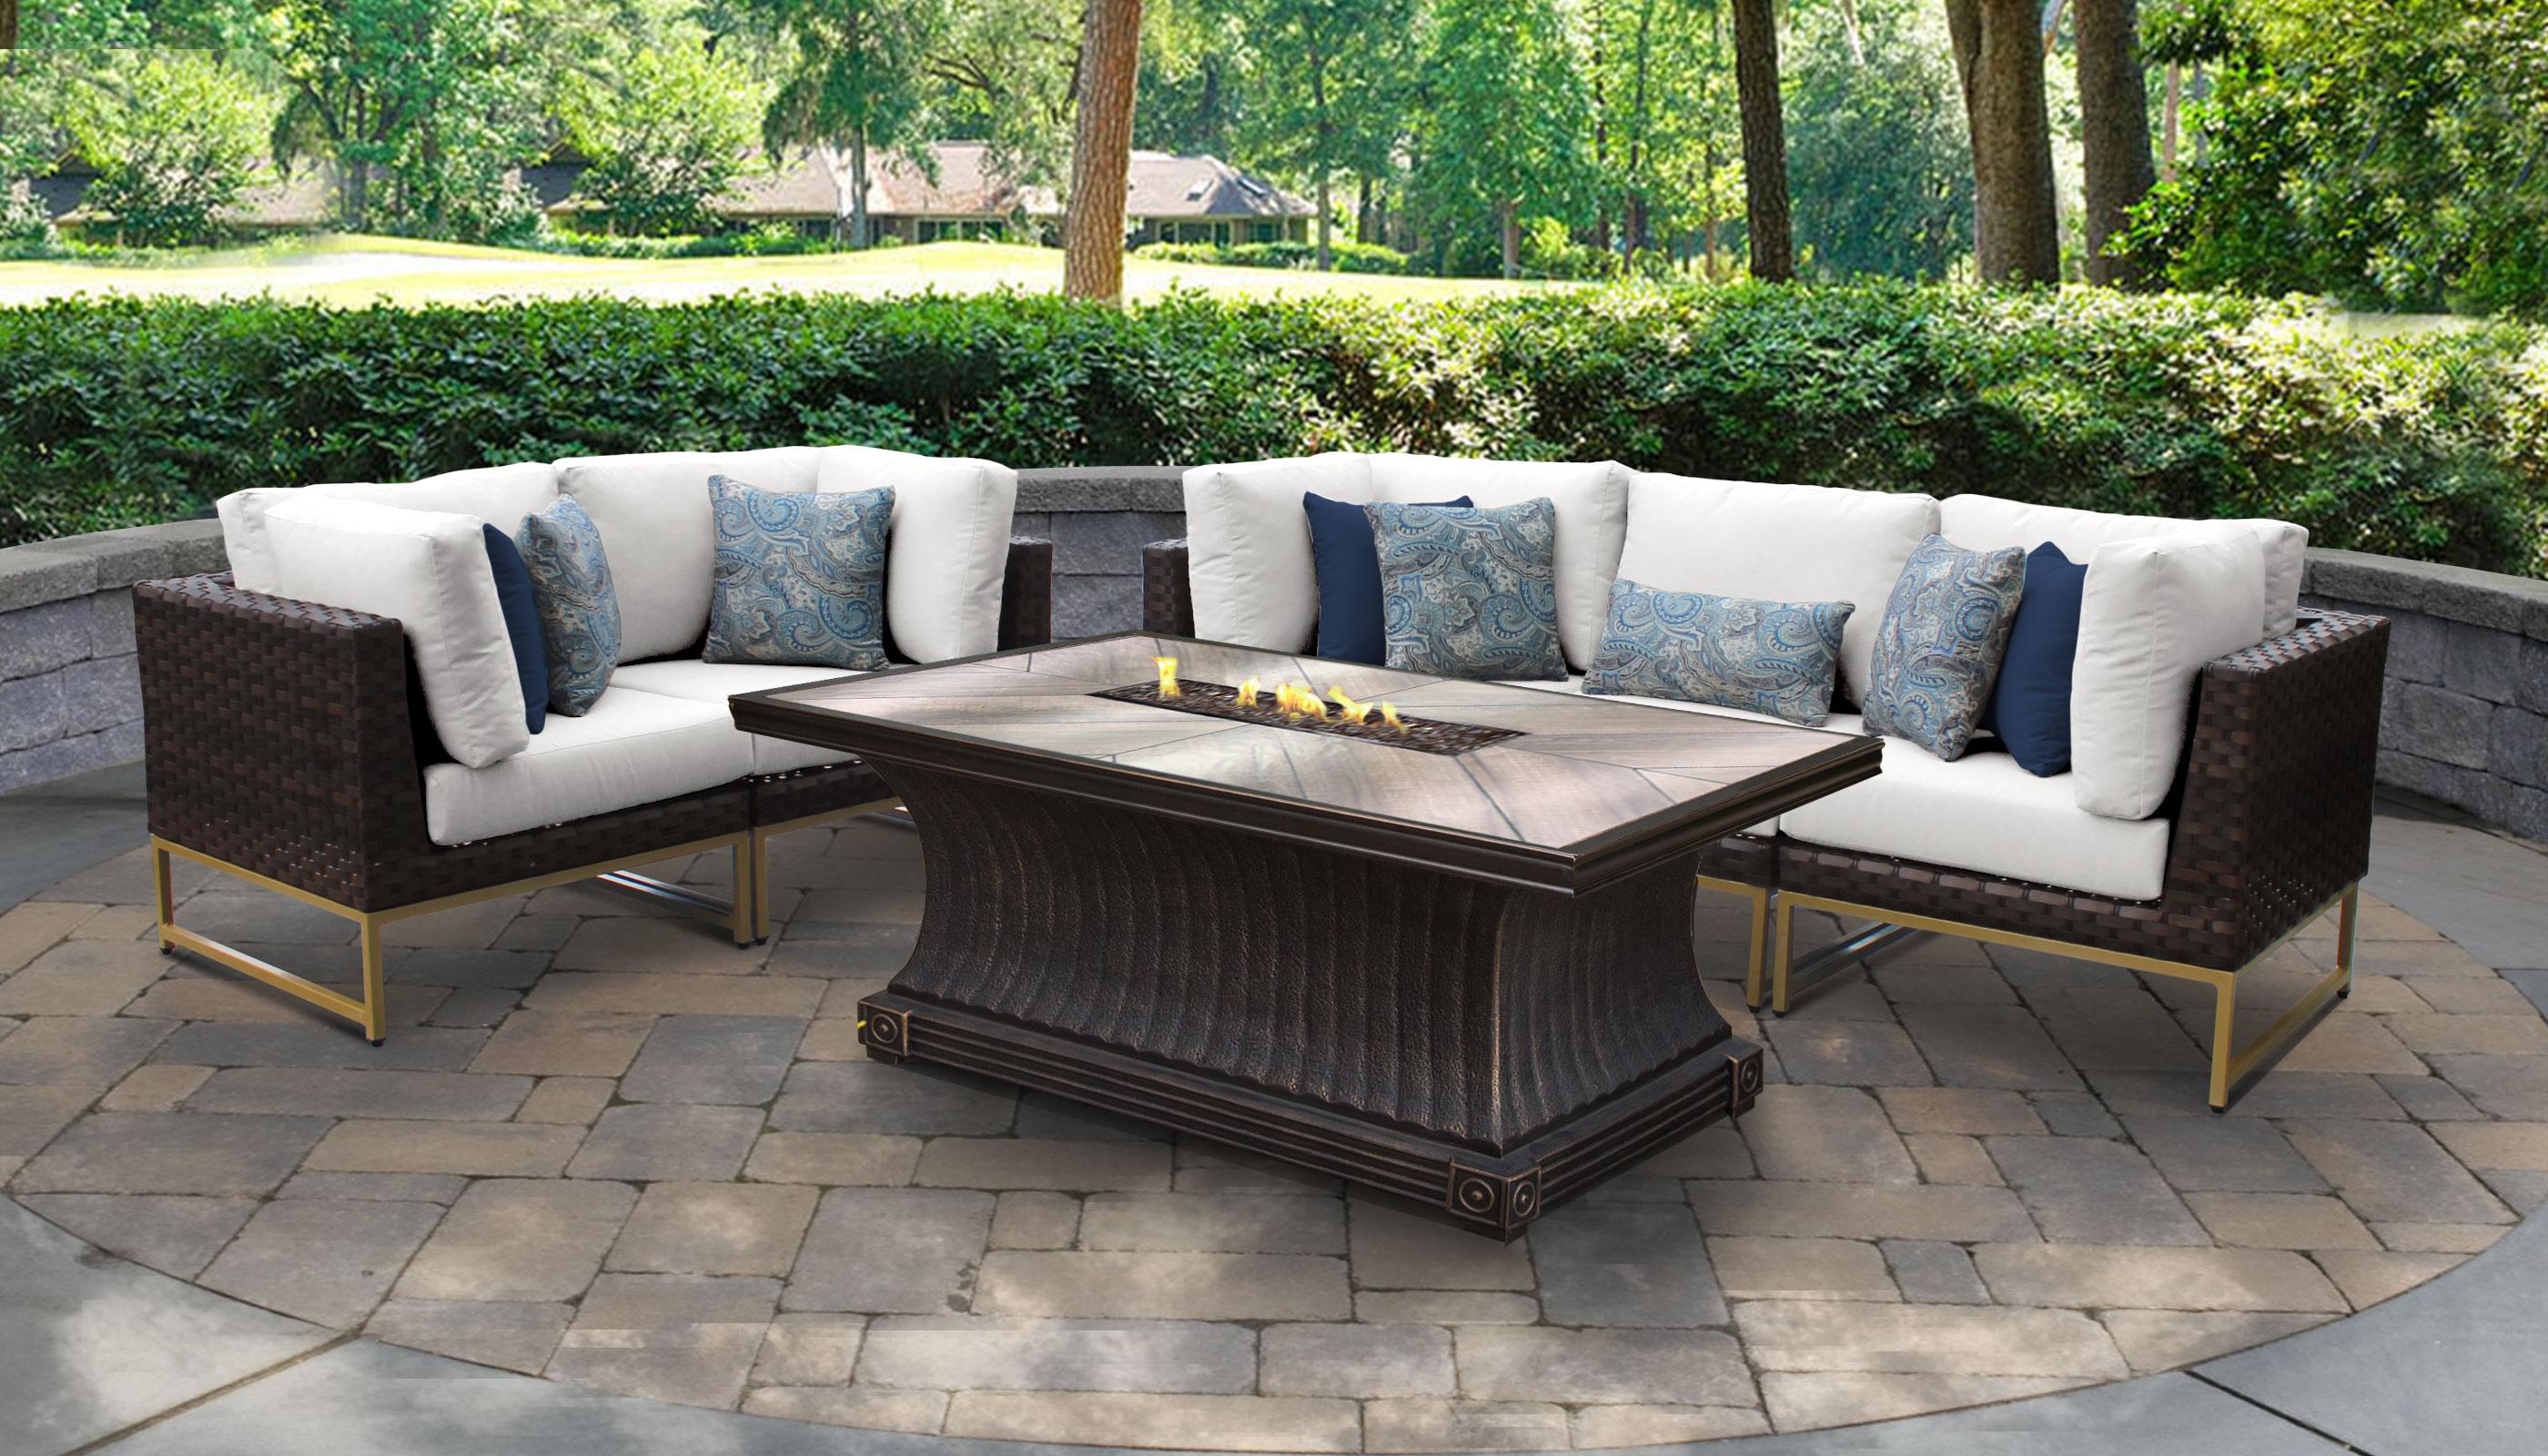 White Barcelona 6 Piece Outdoor Wicker Patio Furniture Set 06n Tk Clics